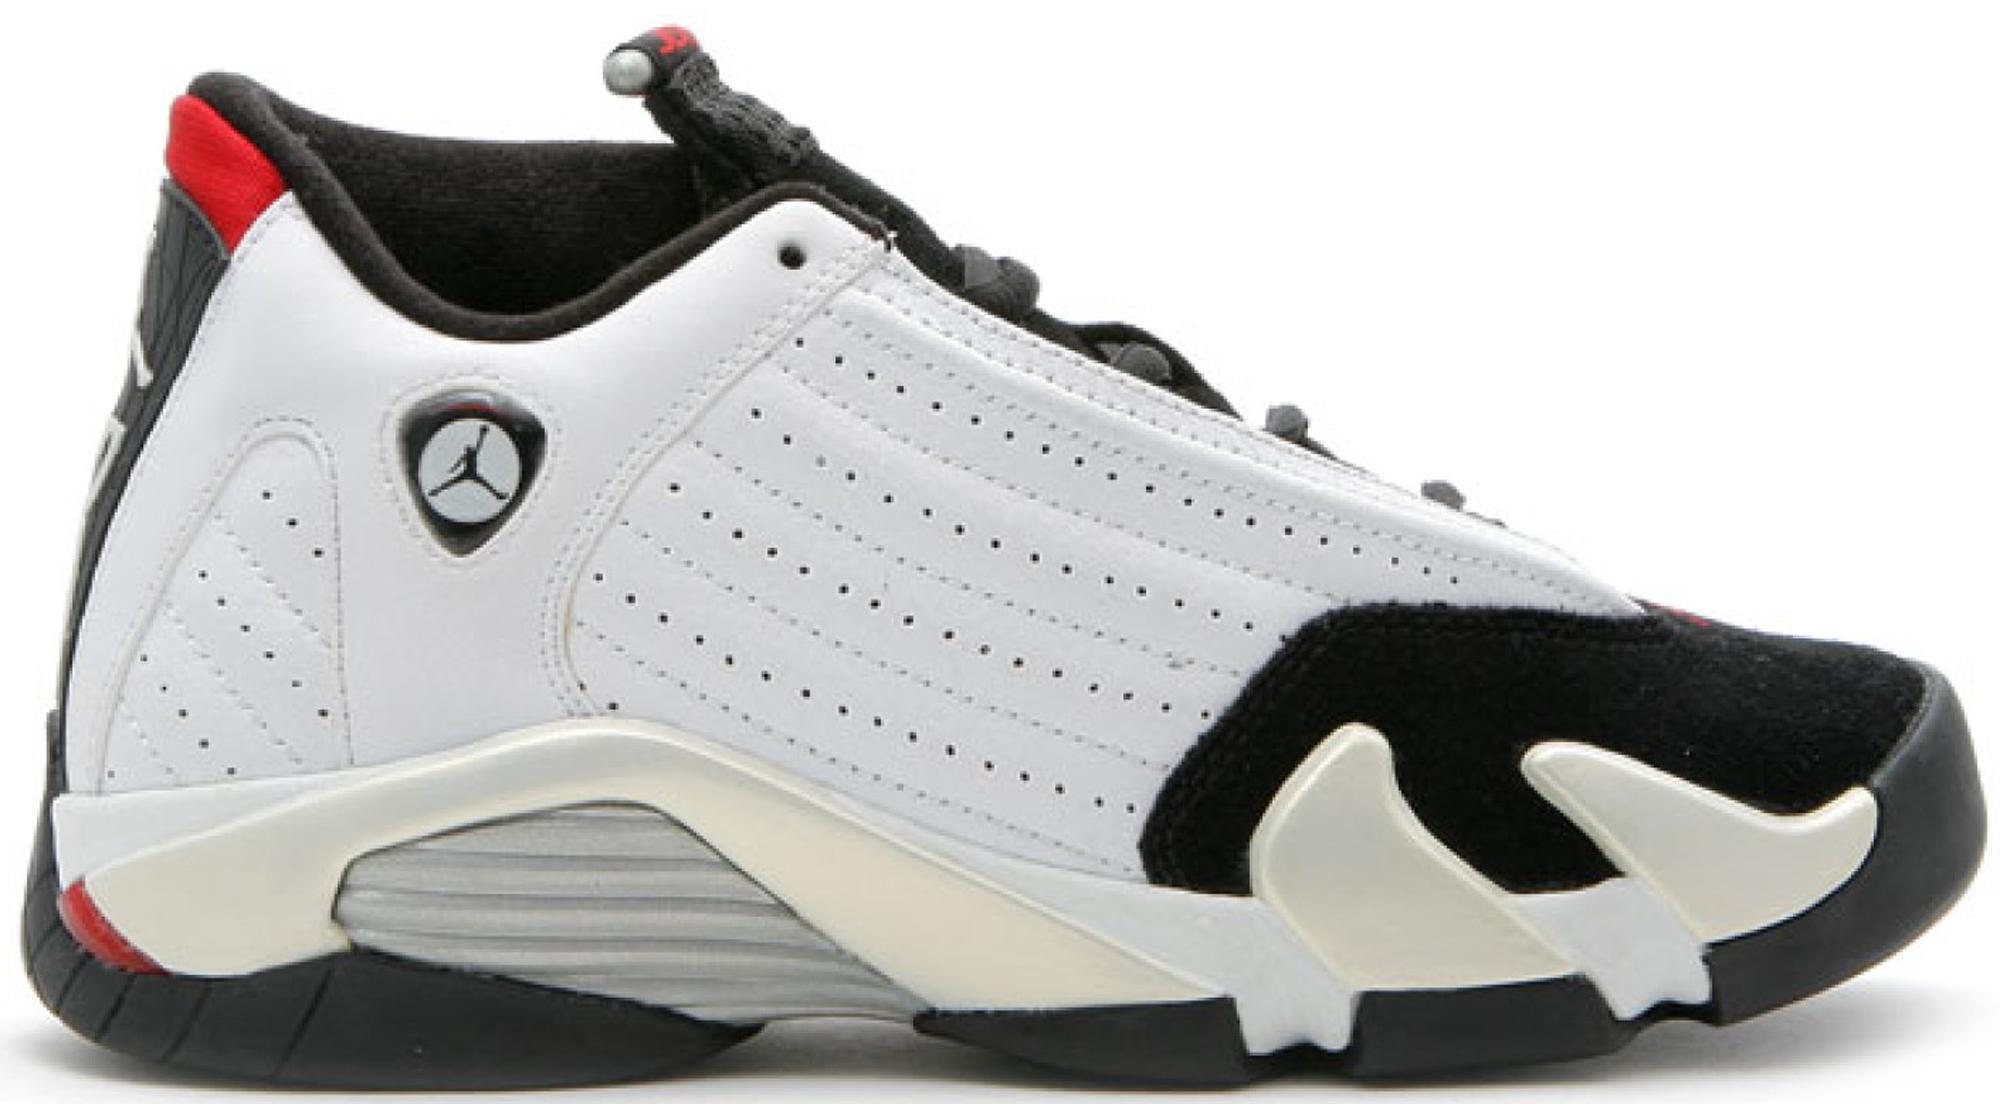 Jordan 14 Retro Black Toe 2006 (GS